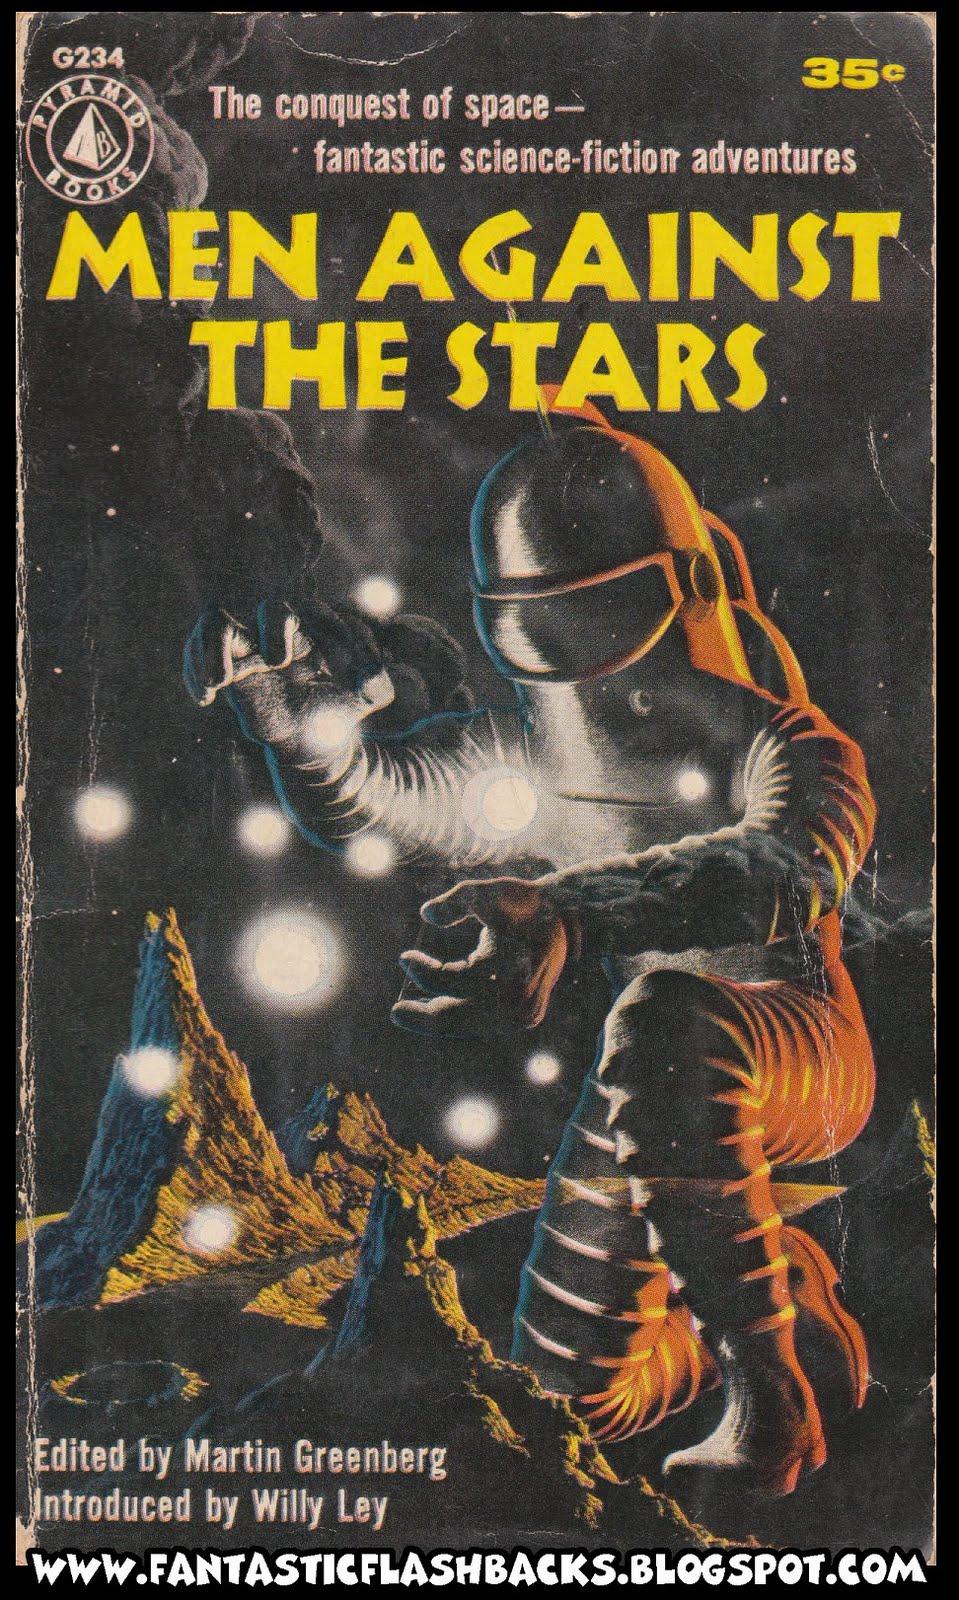 Fantastic Flashbacks: More Sci-Fi Book covers